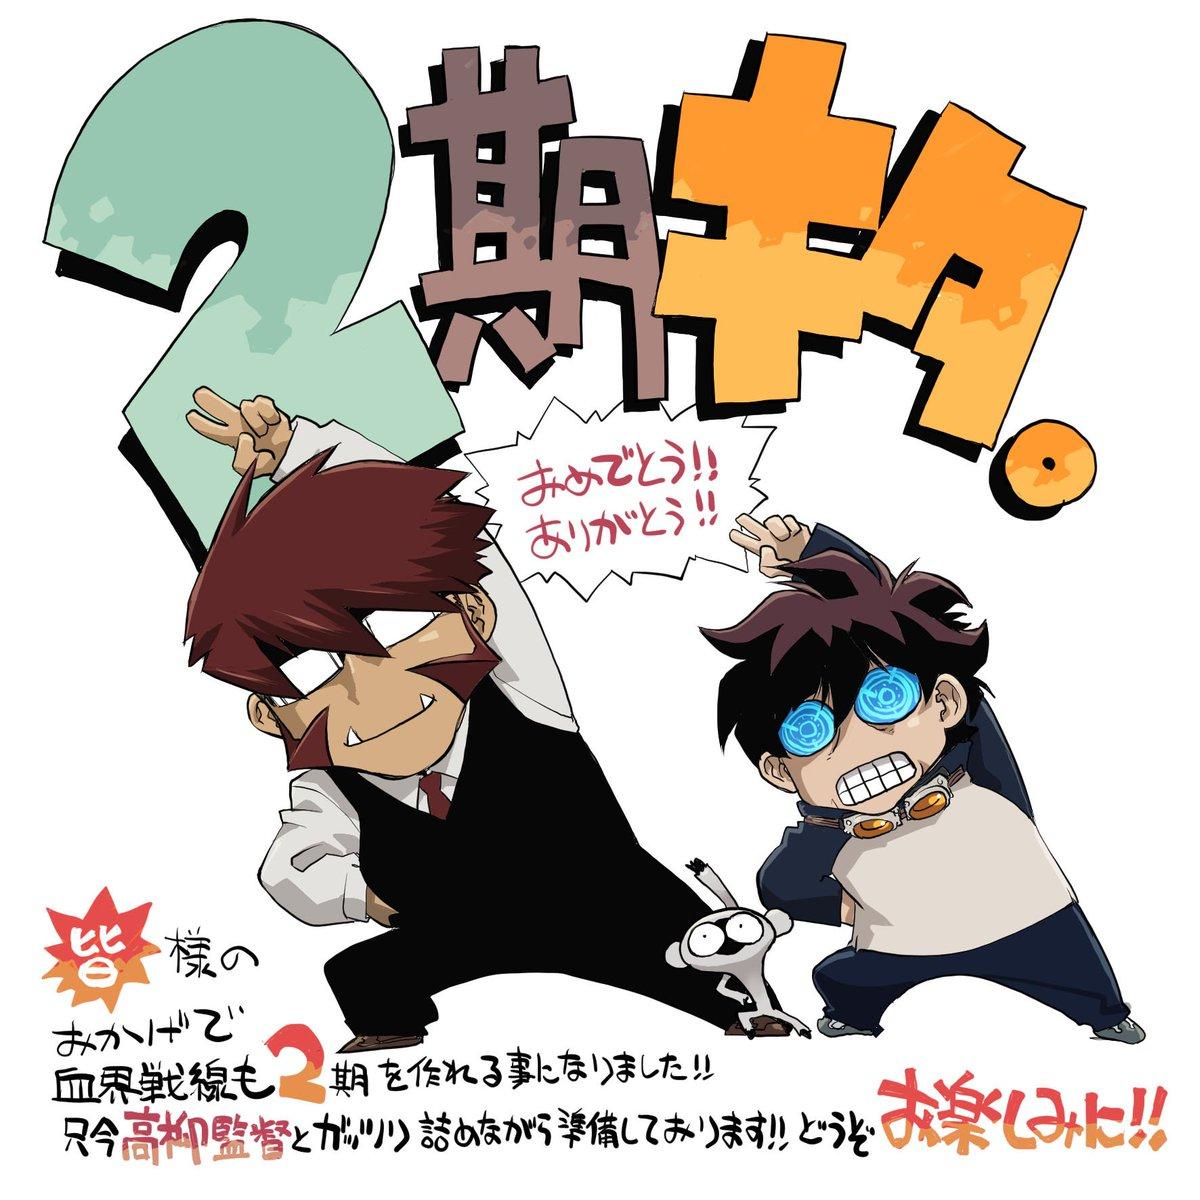 TVアニメ『血界戦線 & BEYOND』制作決定によせて、原作者・内藤泰弘先生から直筆コメント到着です!!!!!